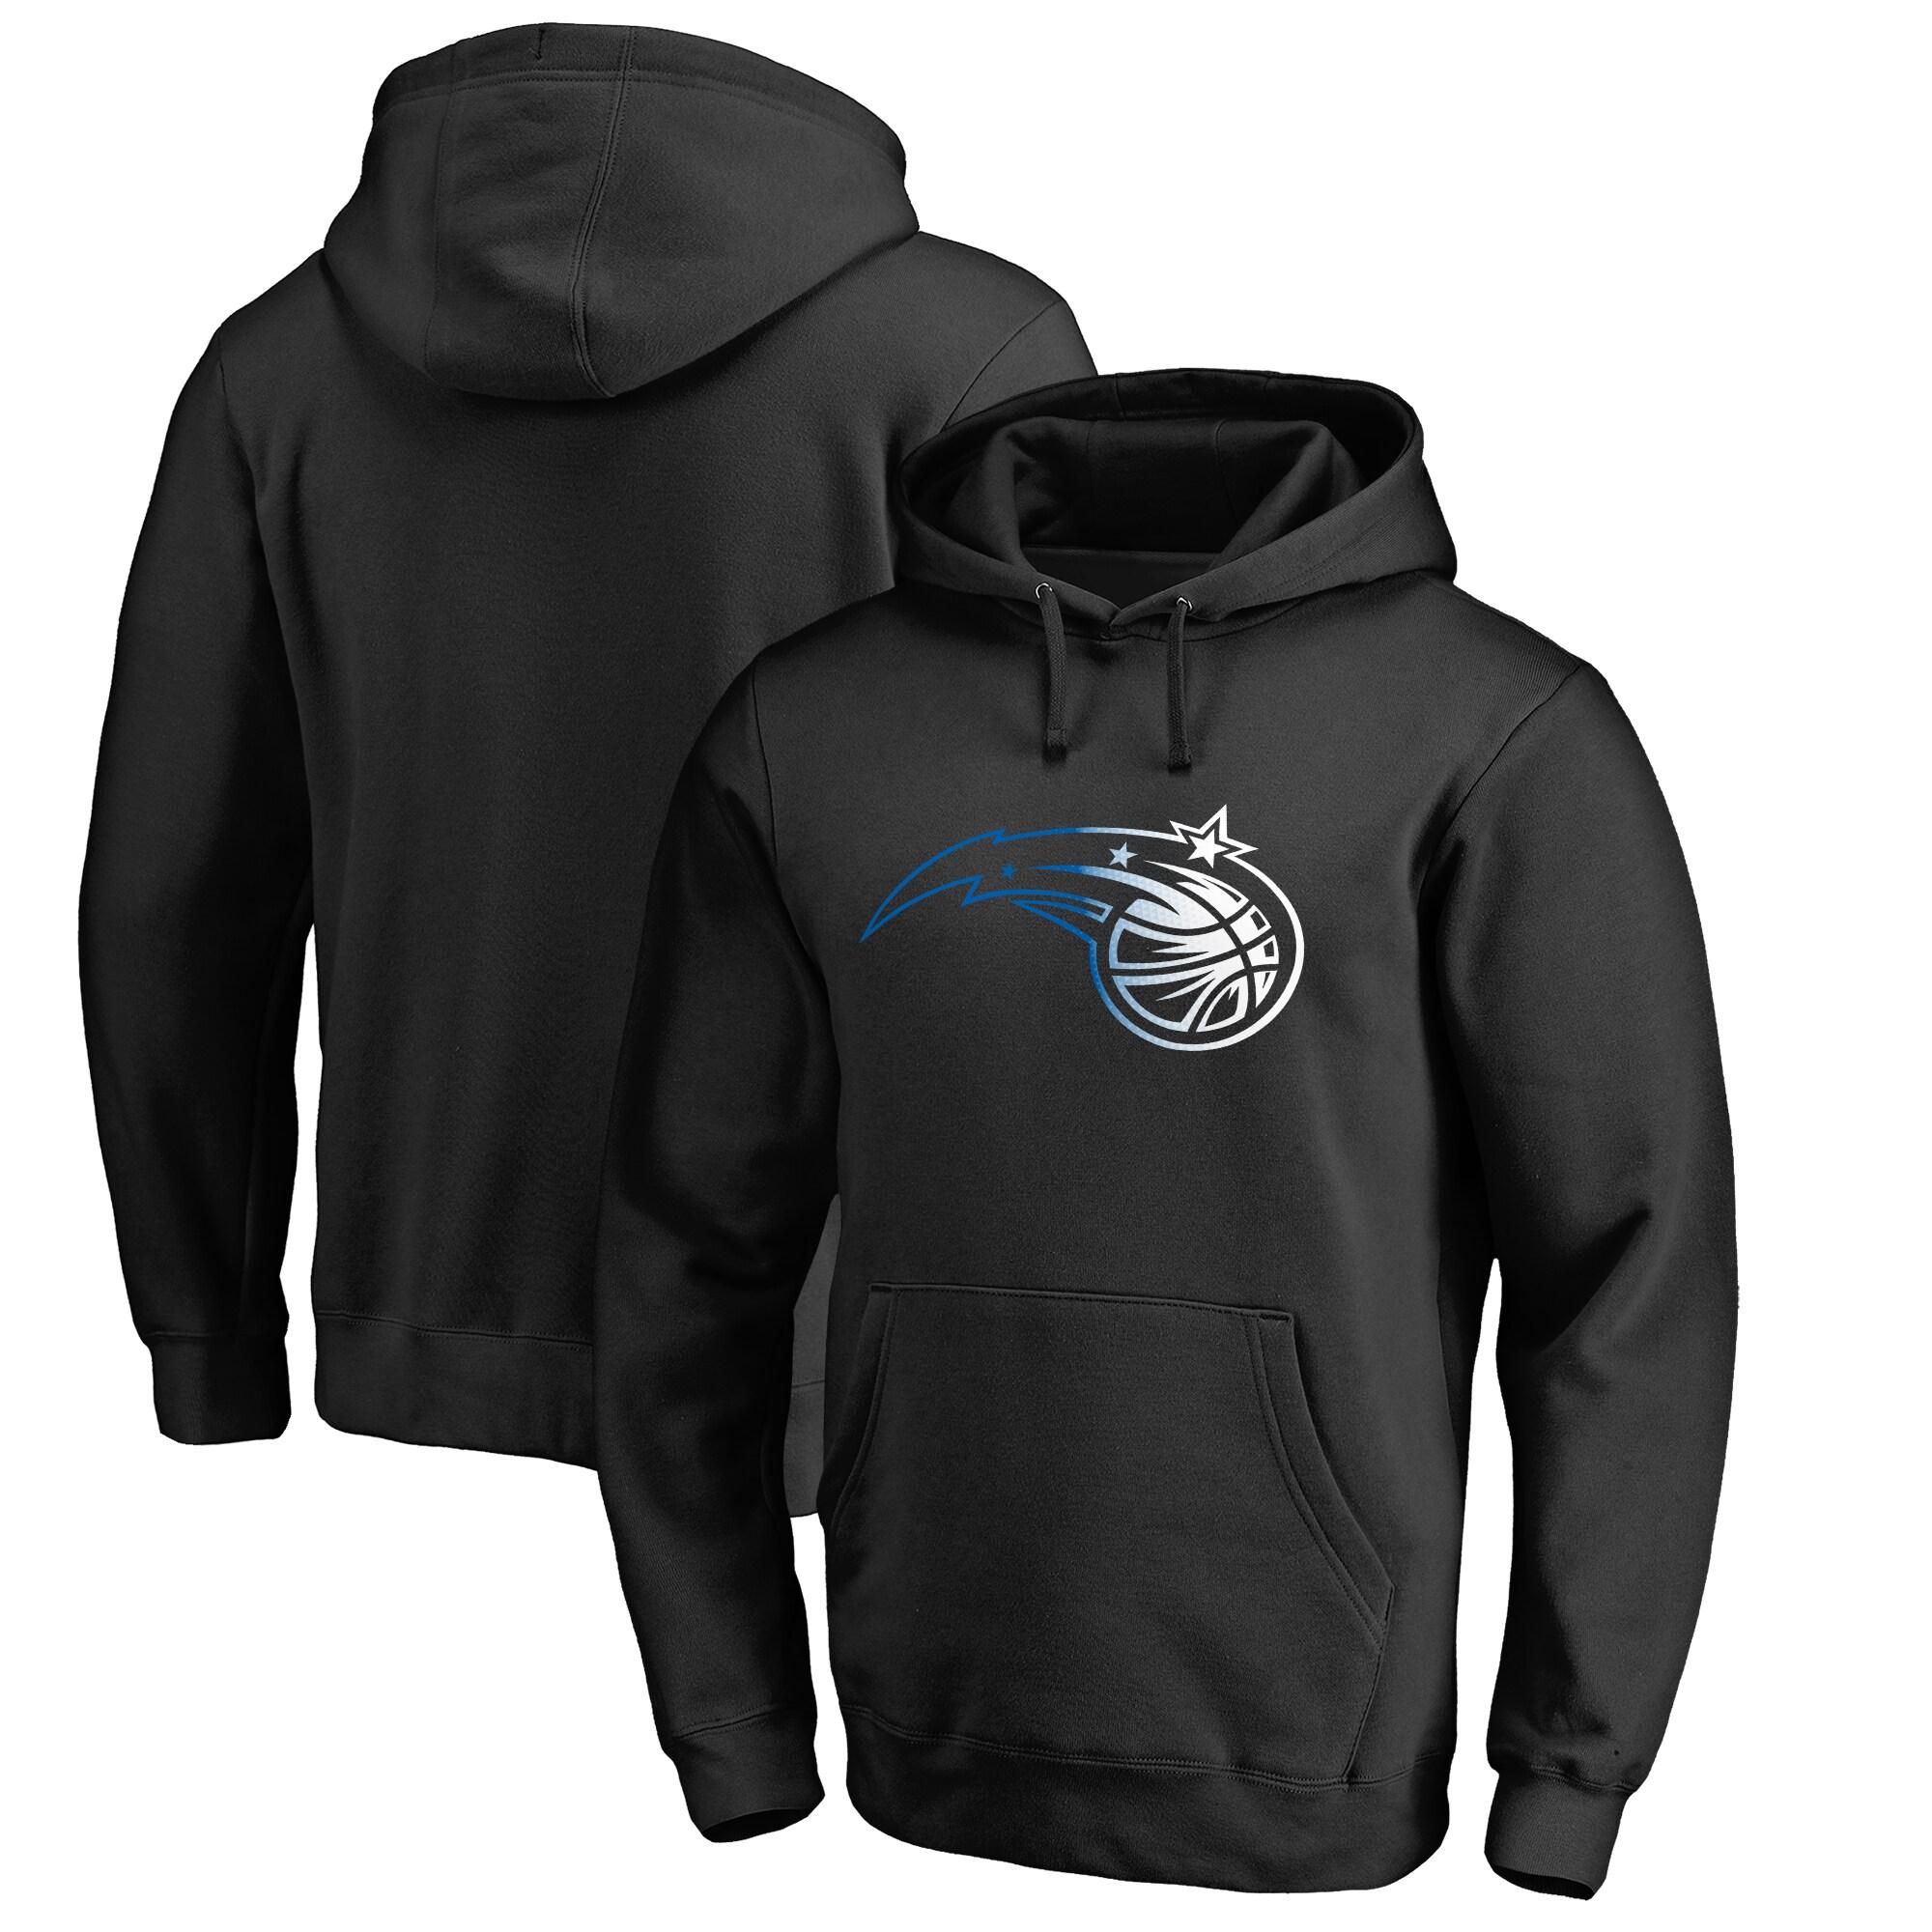 Orlando Magic Fanatics Branded Big & Tall Gradient Logo Pullover Hoodie - Black